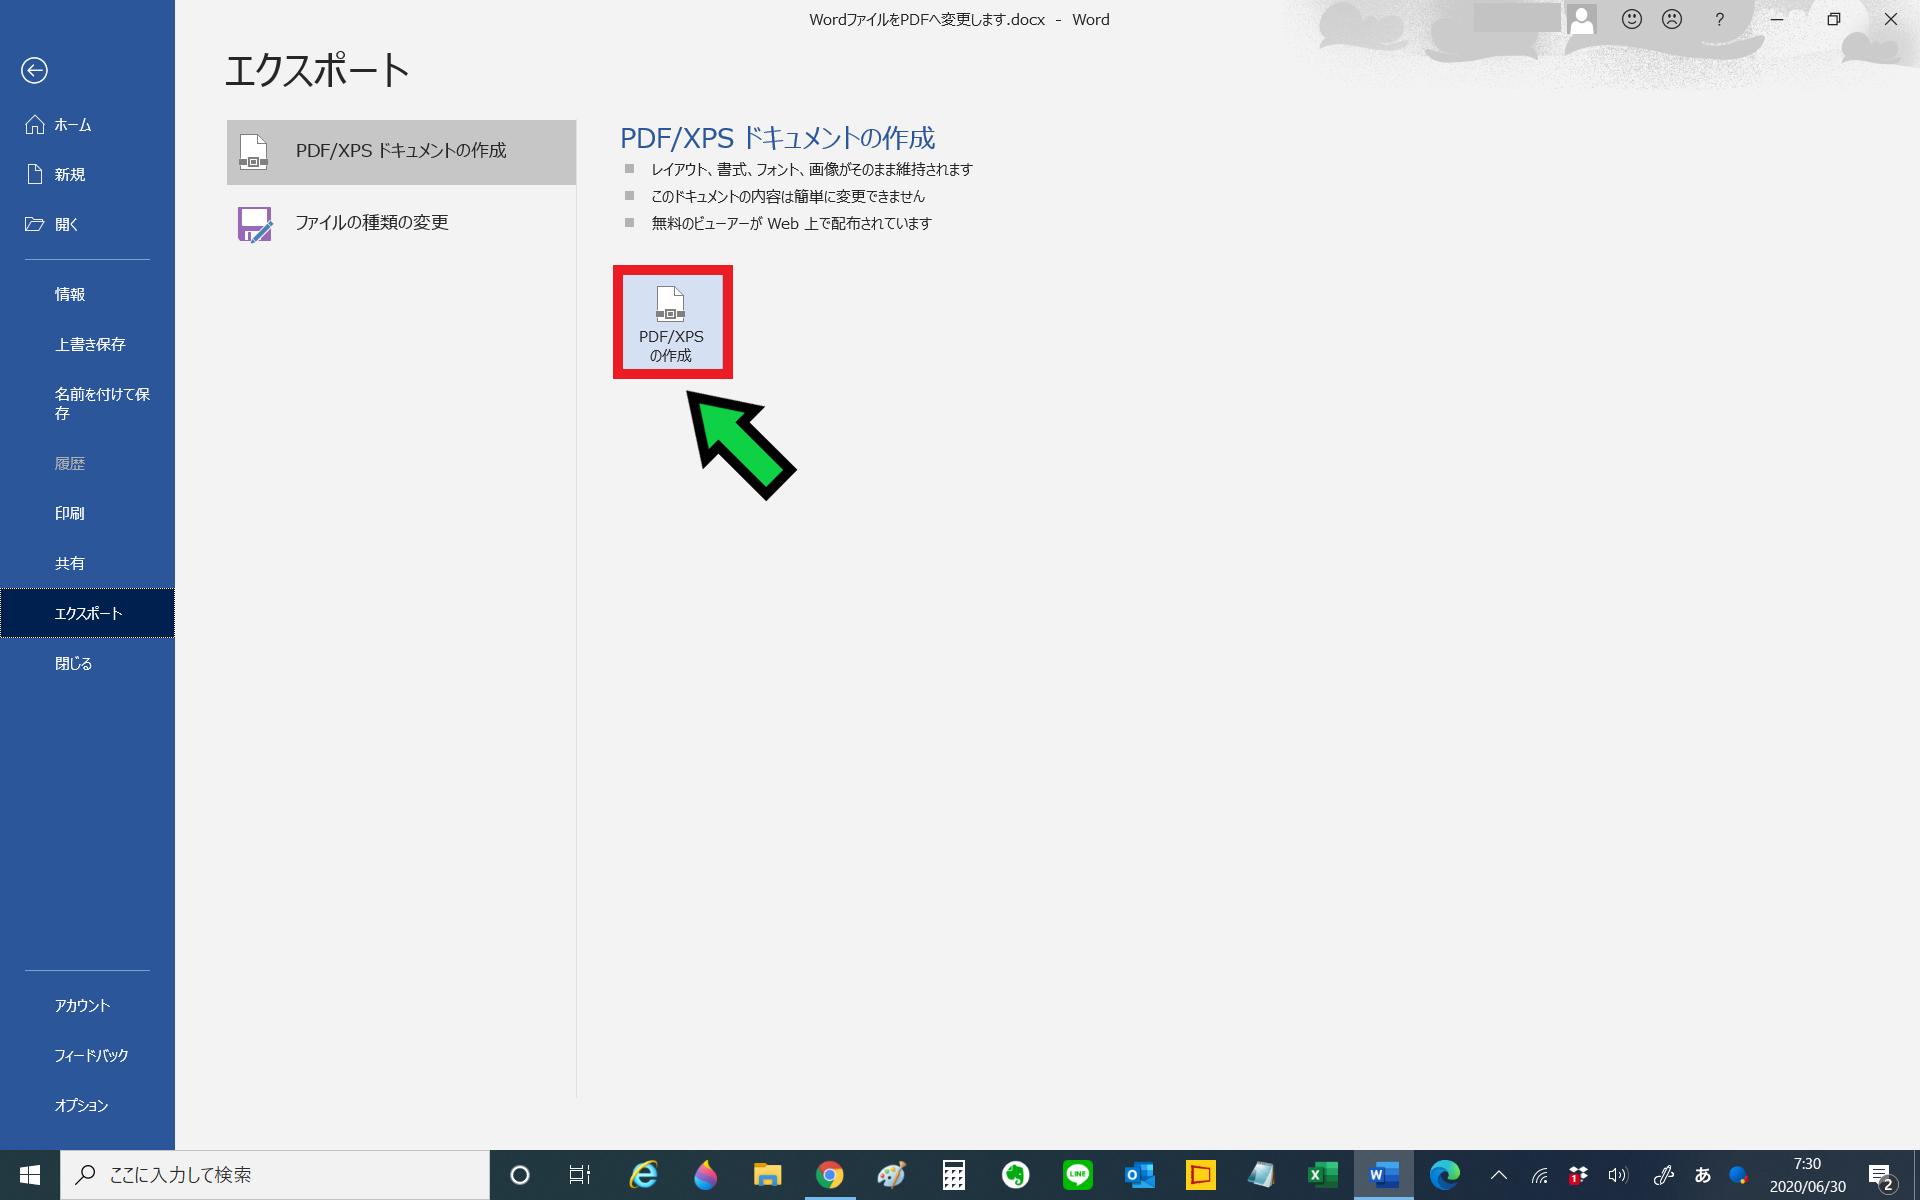 wordファイルをPDFへ変換する方法